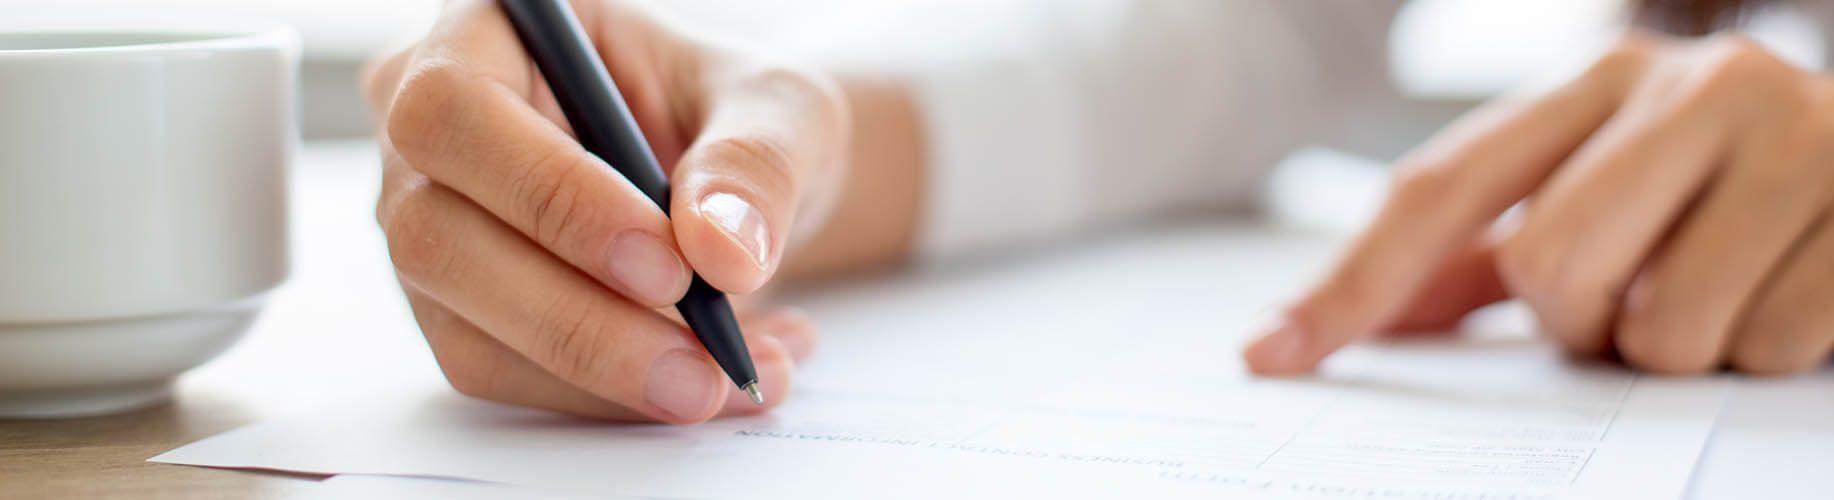 Mentions légales -Julie Saba formatrice en webmarketing